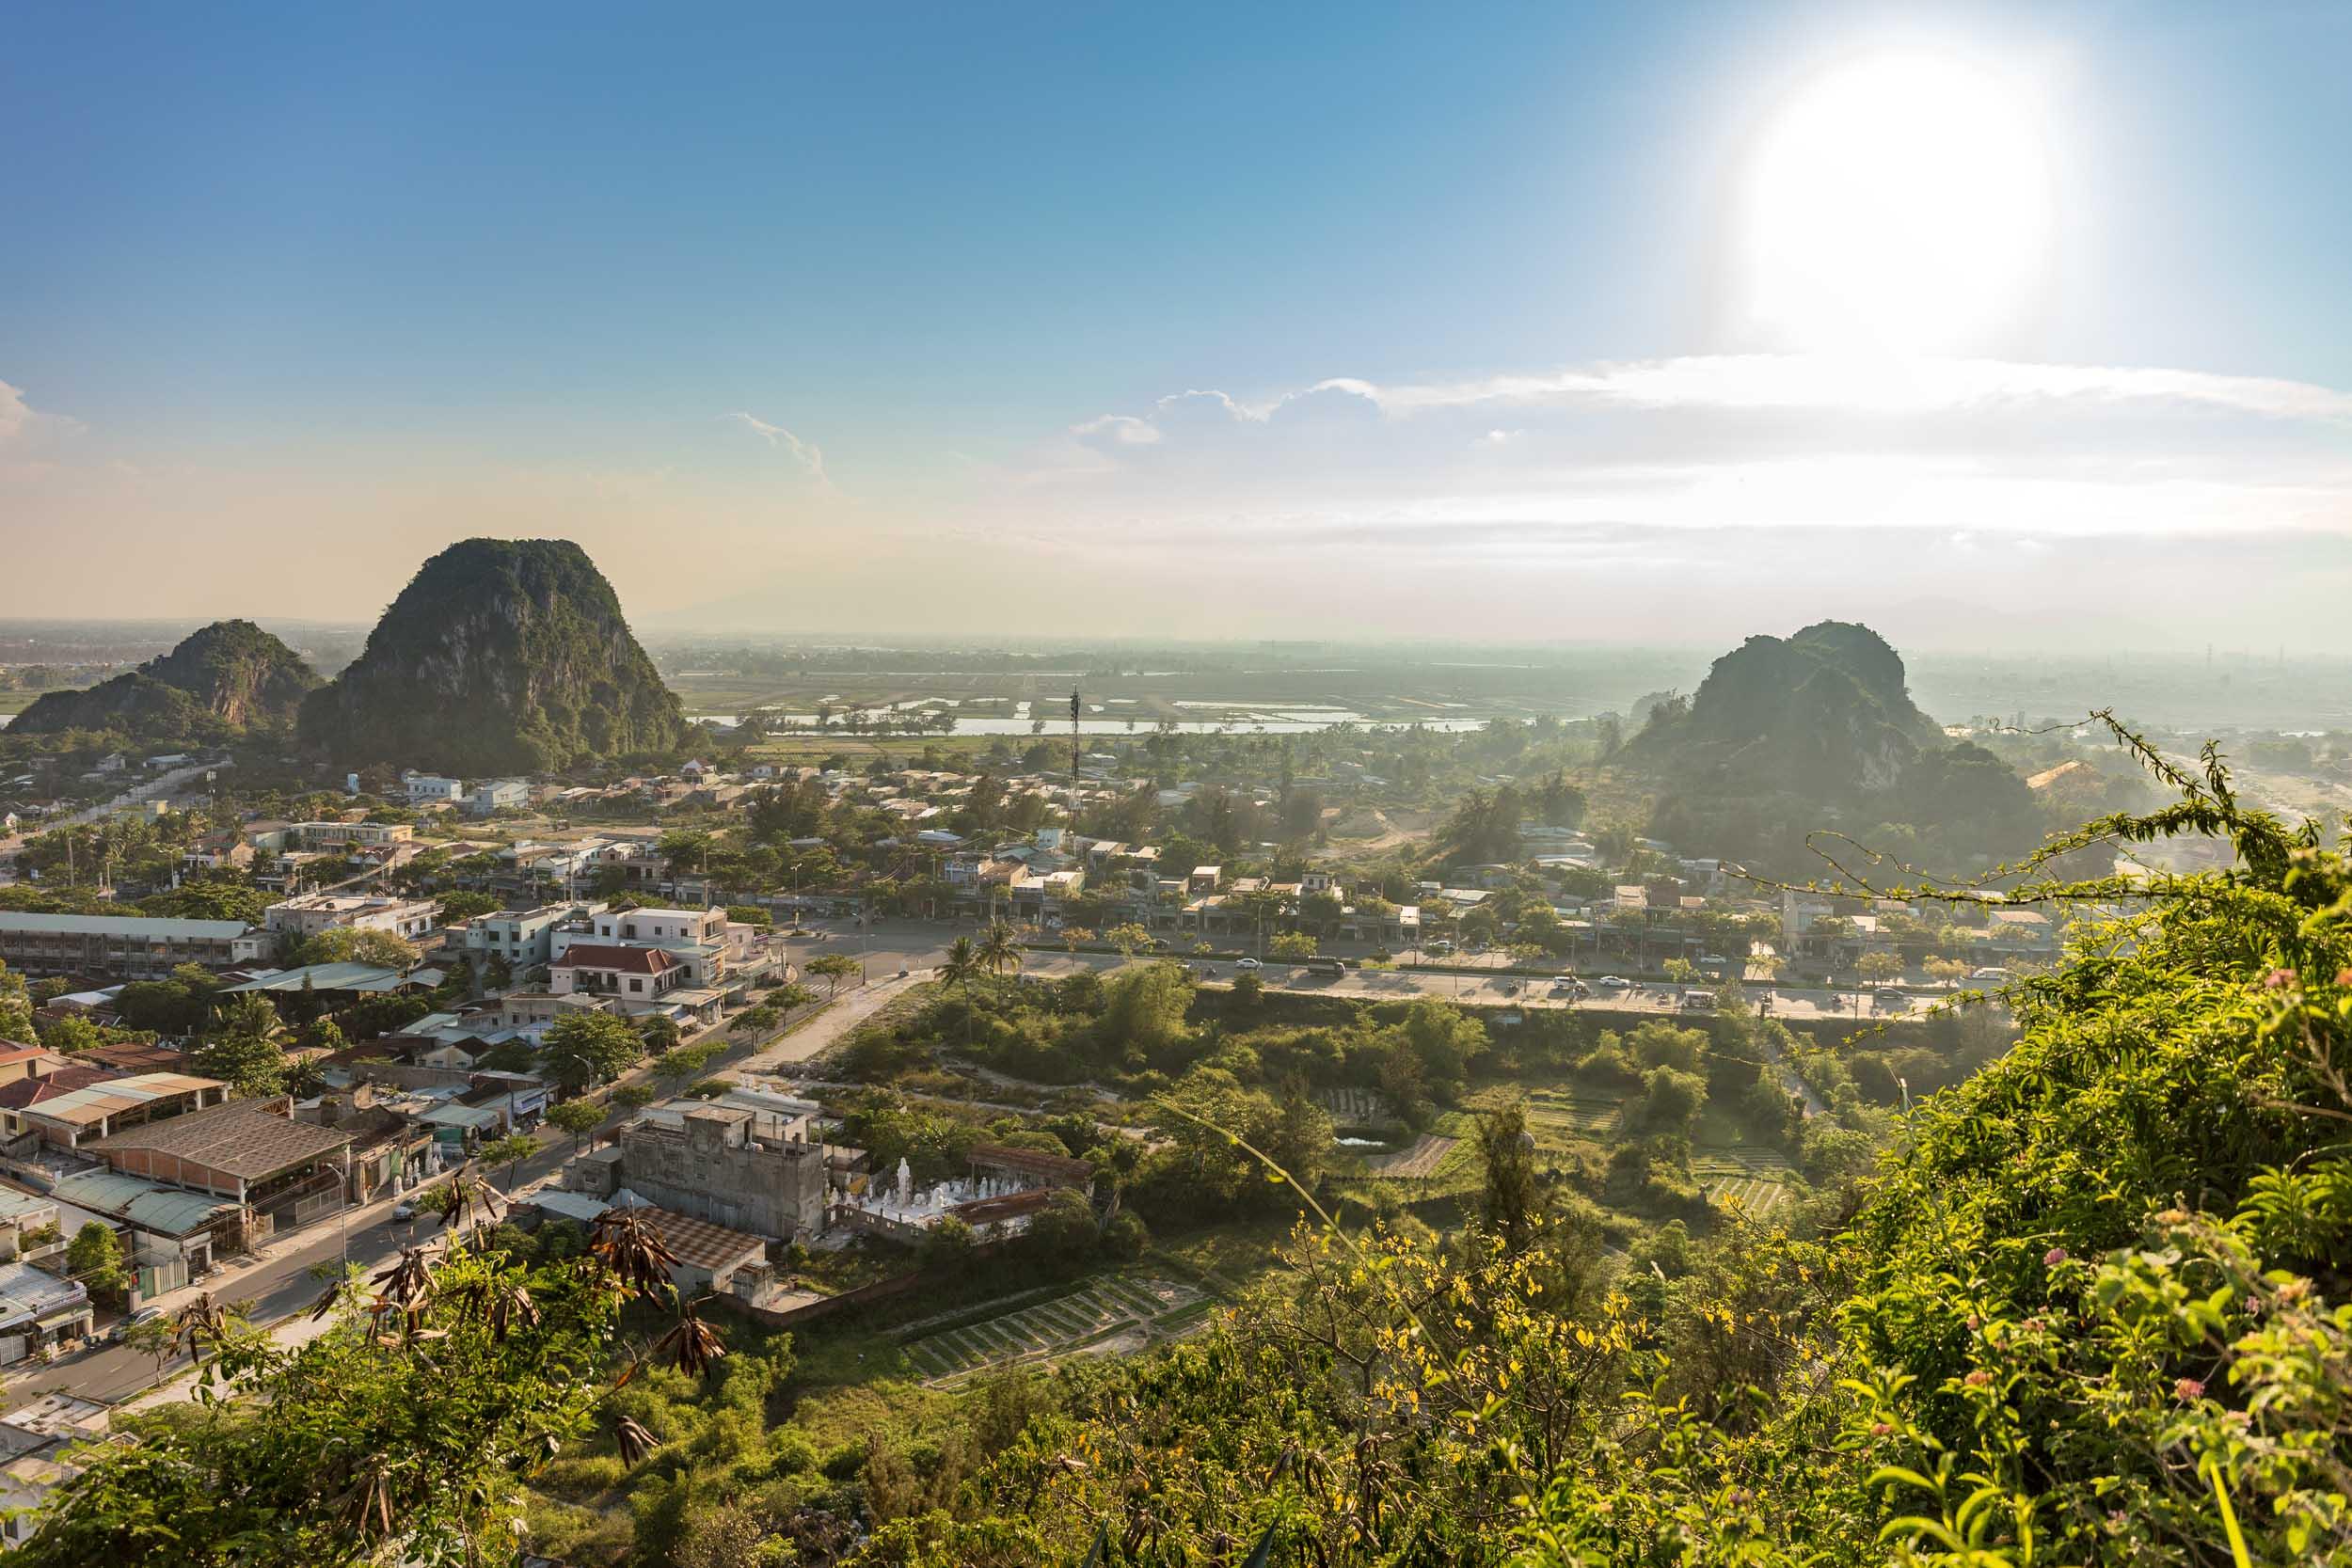 View of Da Nang from Marble Mountain